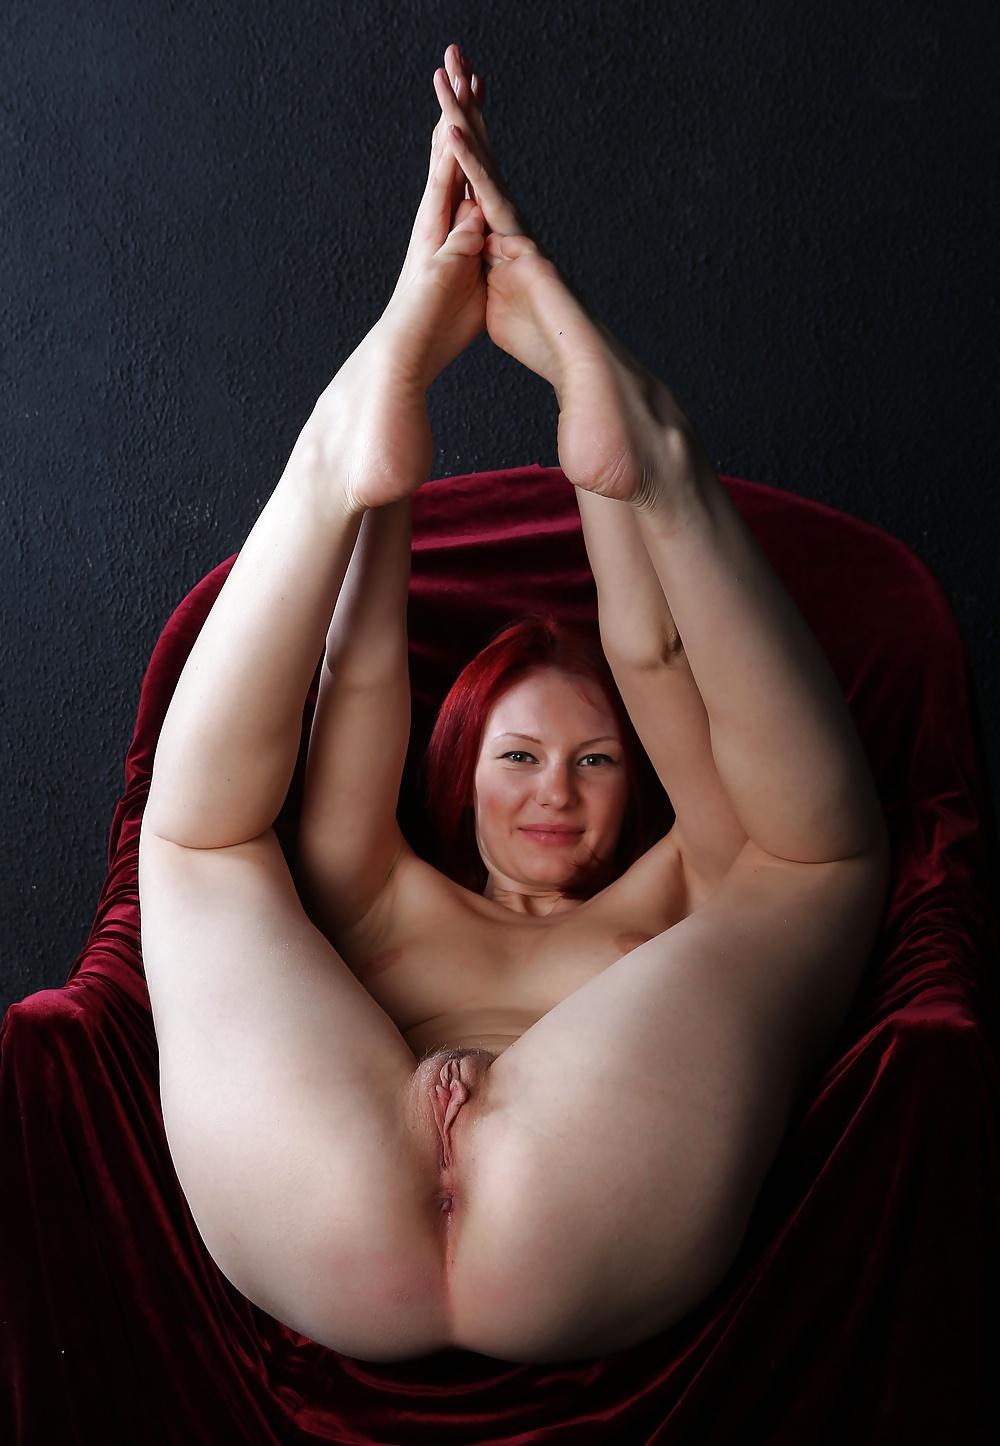 porno strand erotik amberg